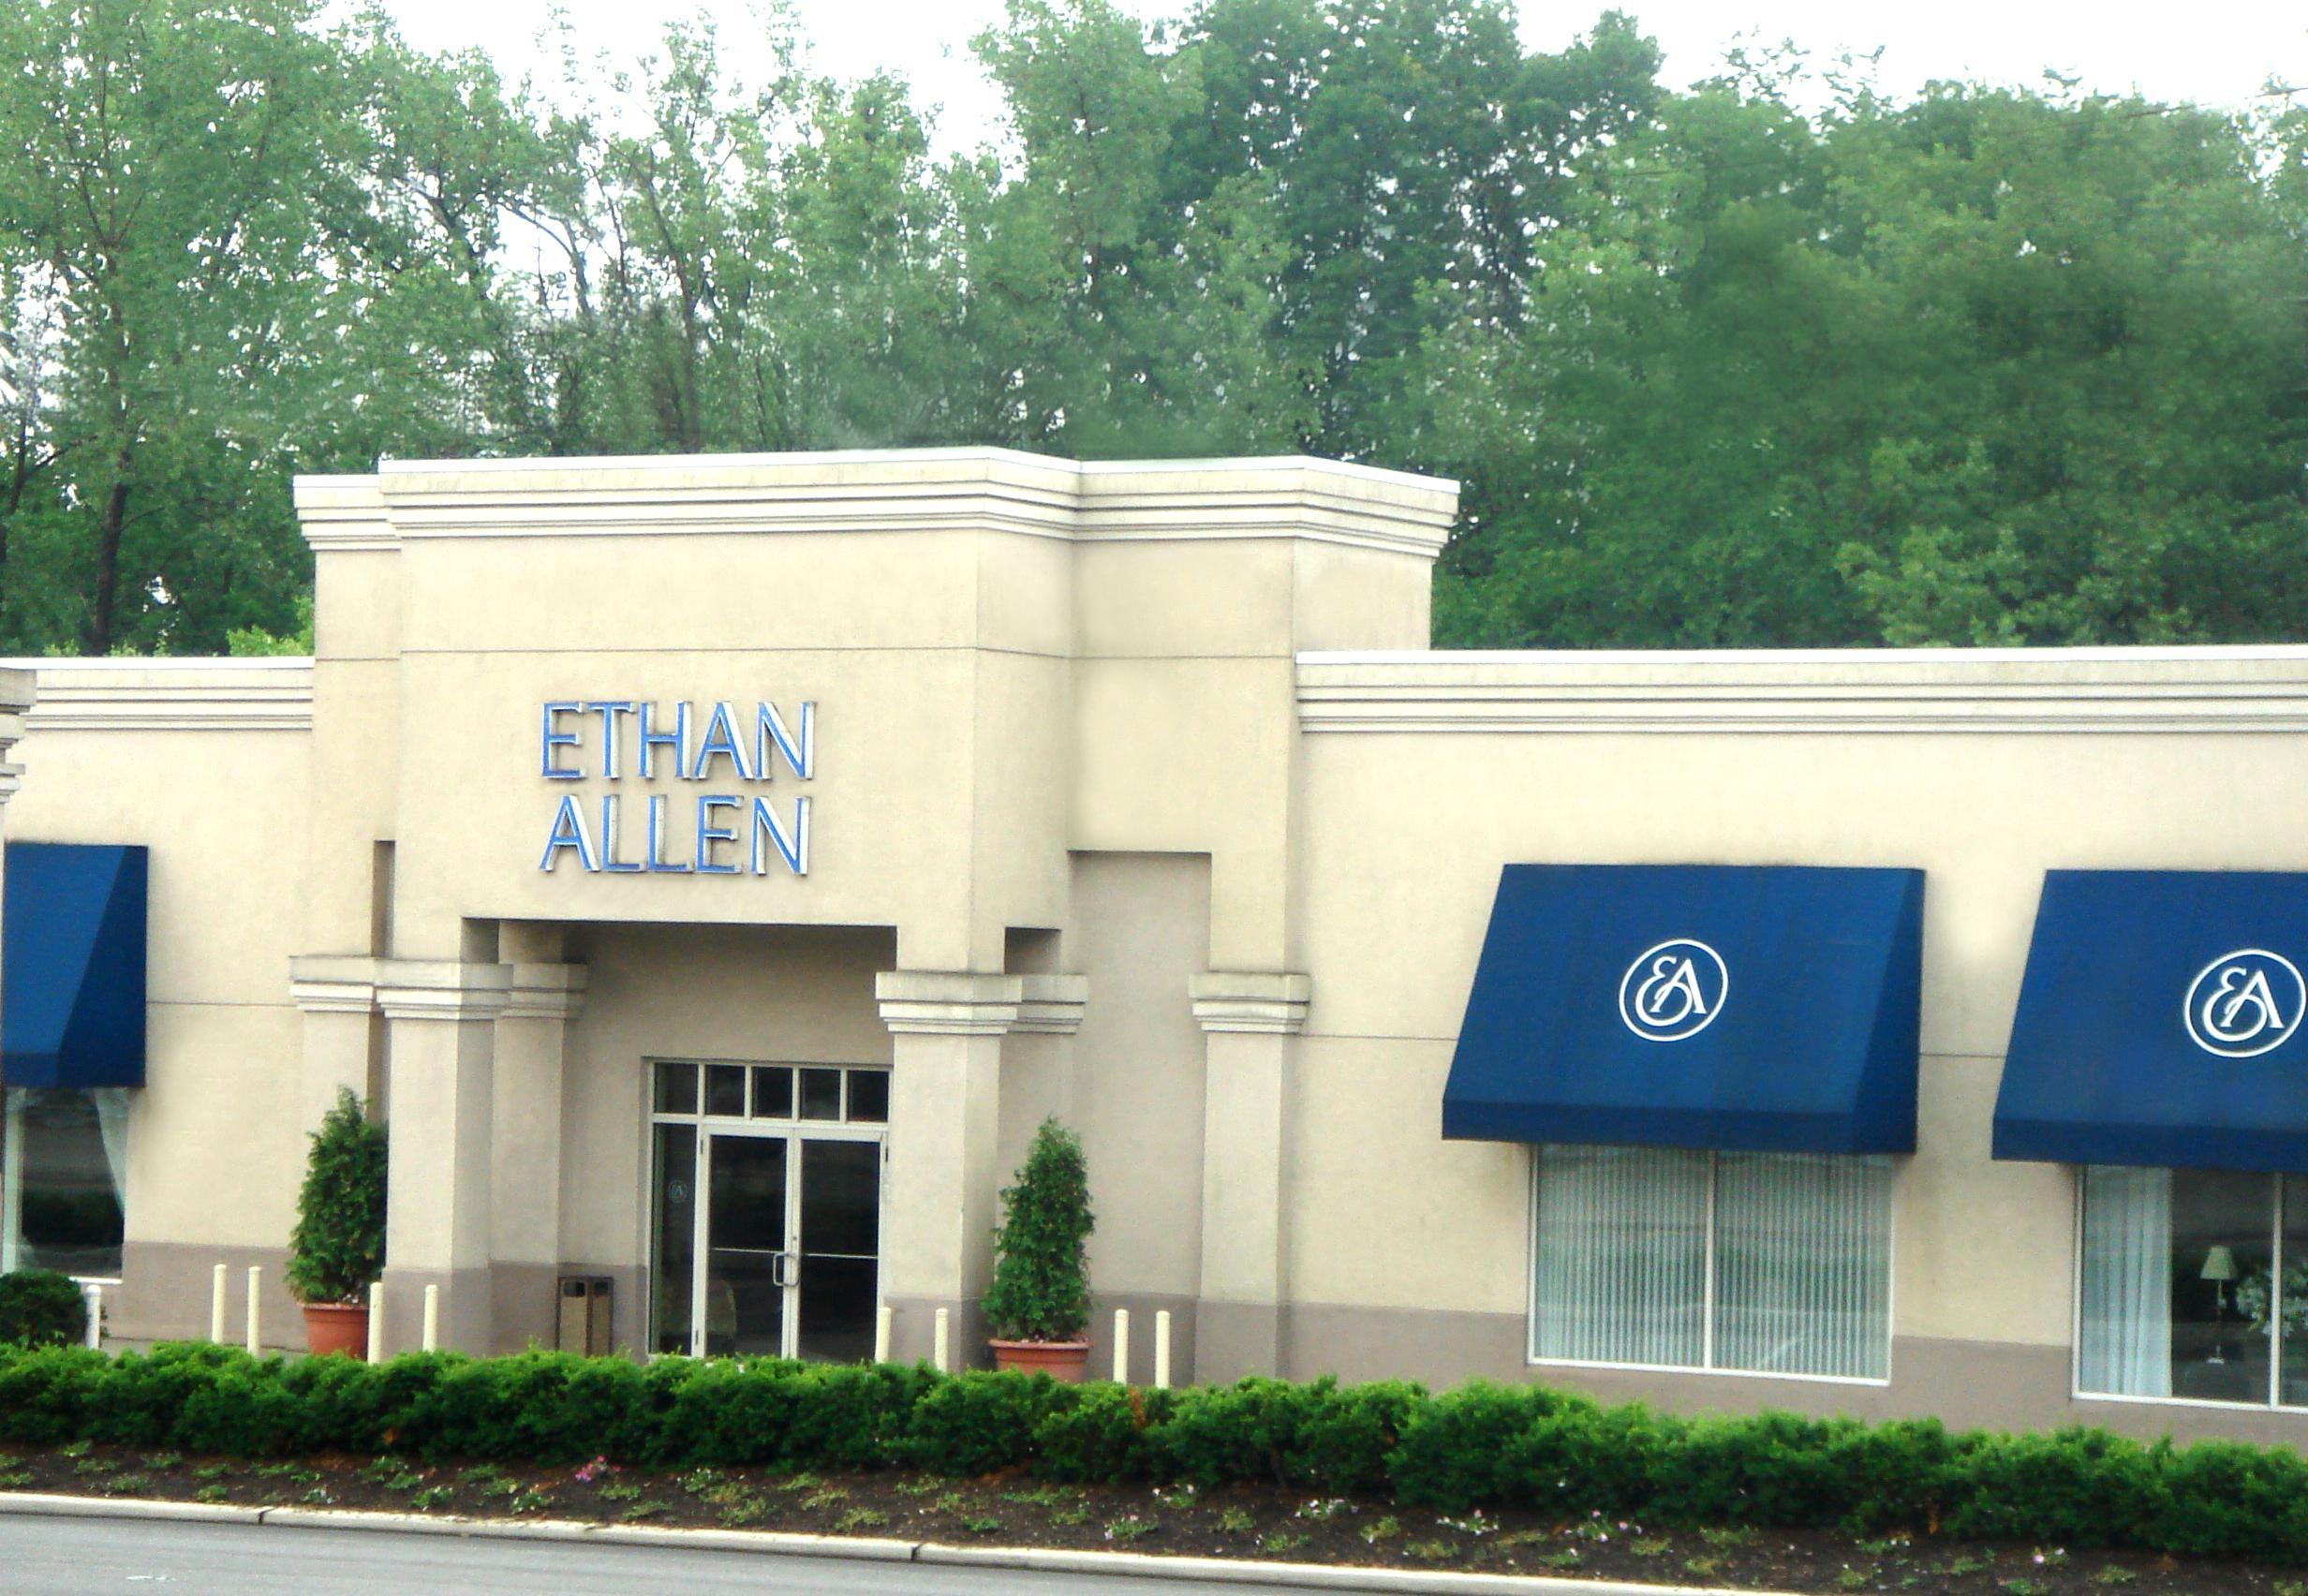 Ethan Allen River Edge New Jersey Nj Localdatabase Com